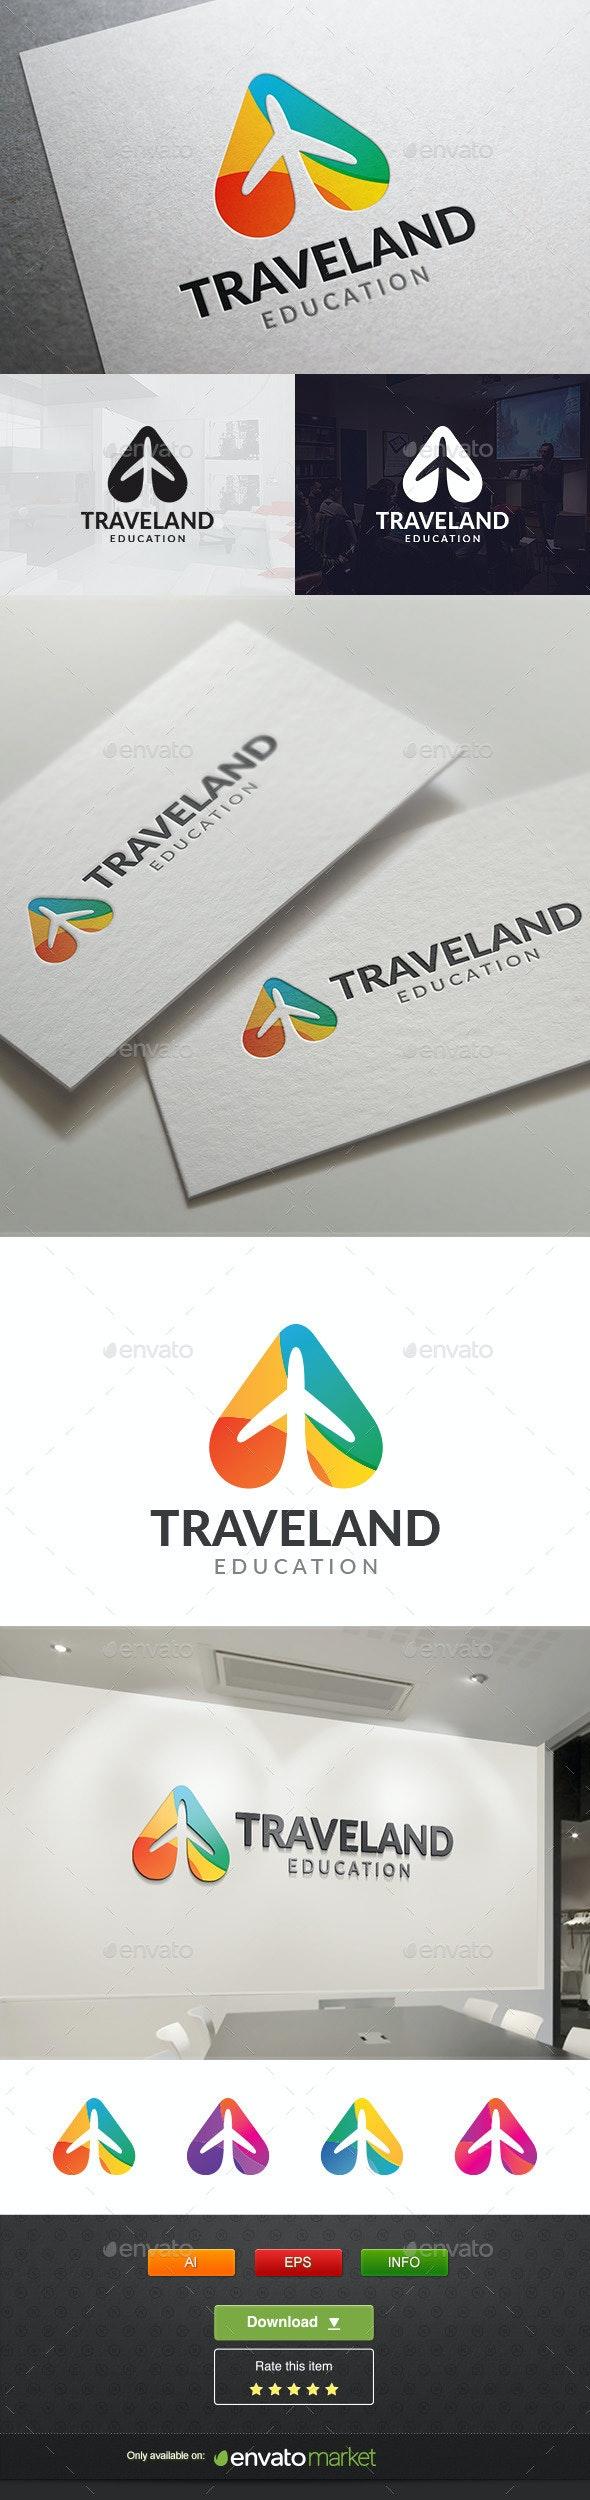 Travel Land